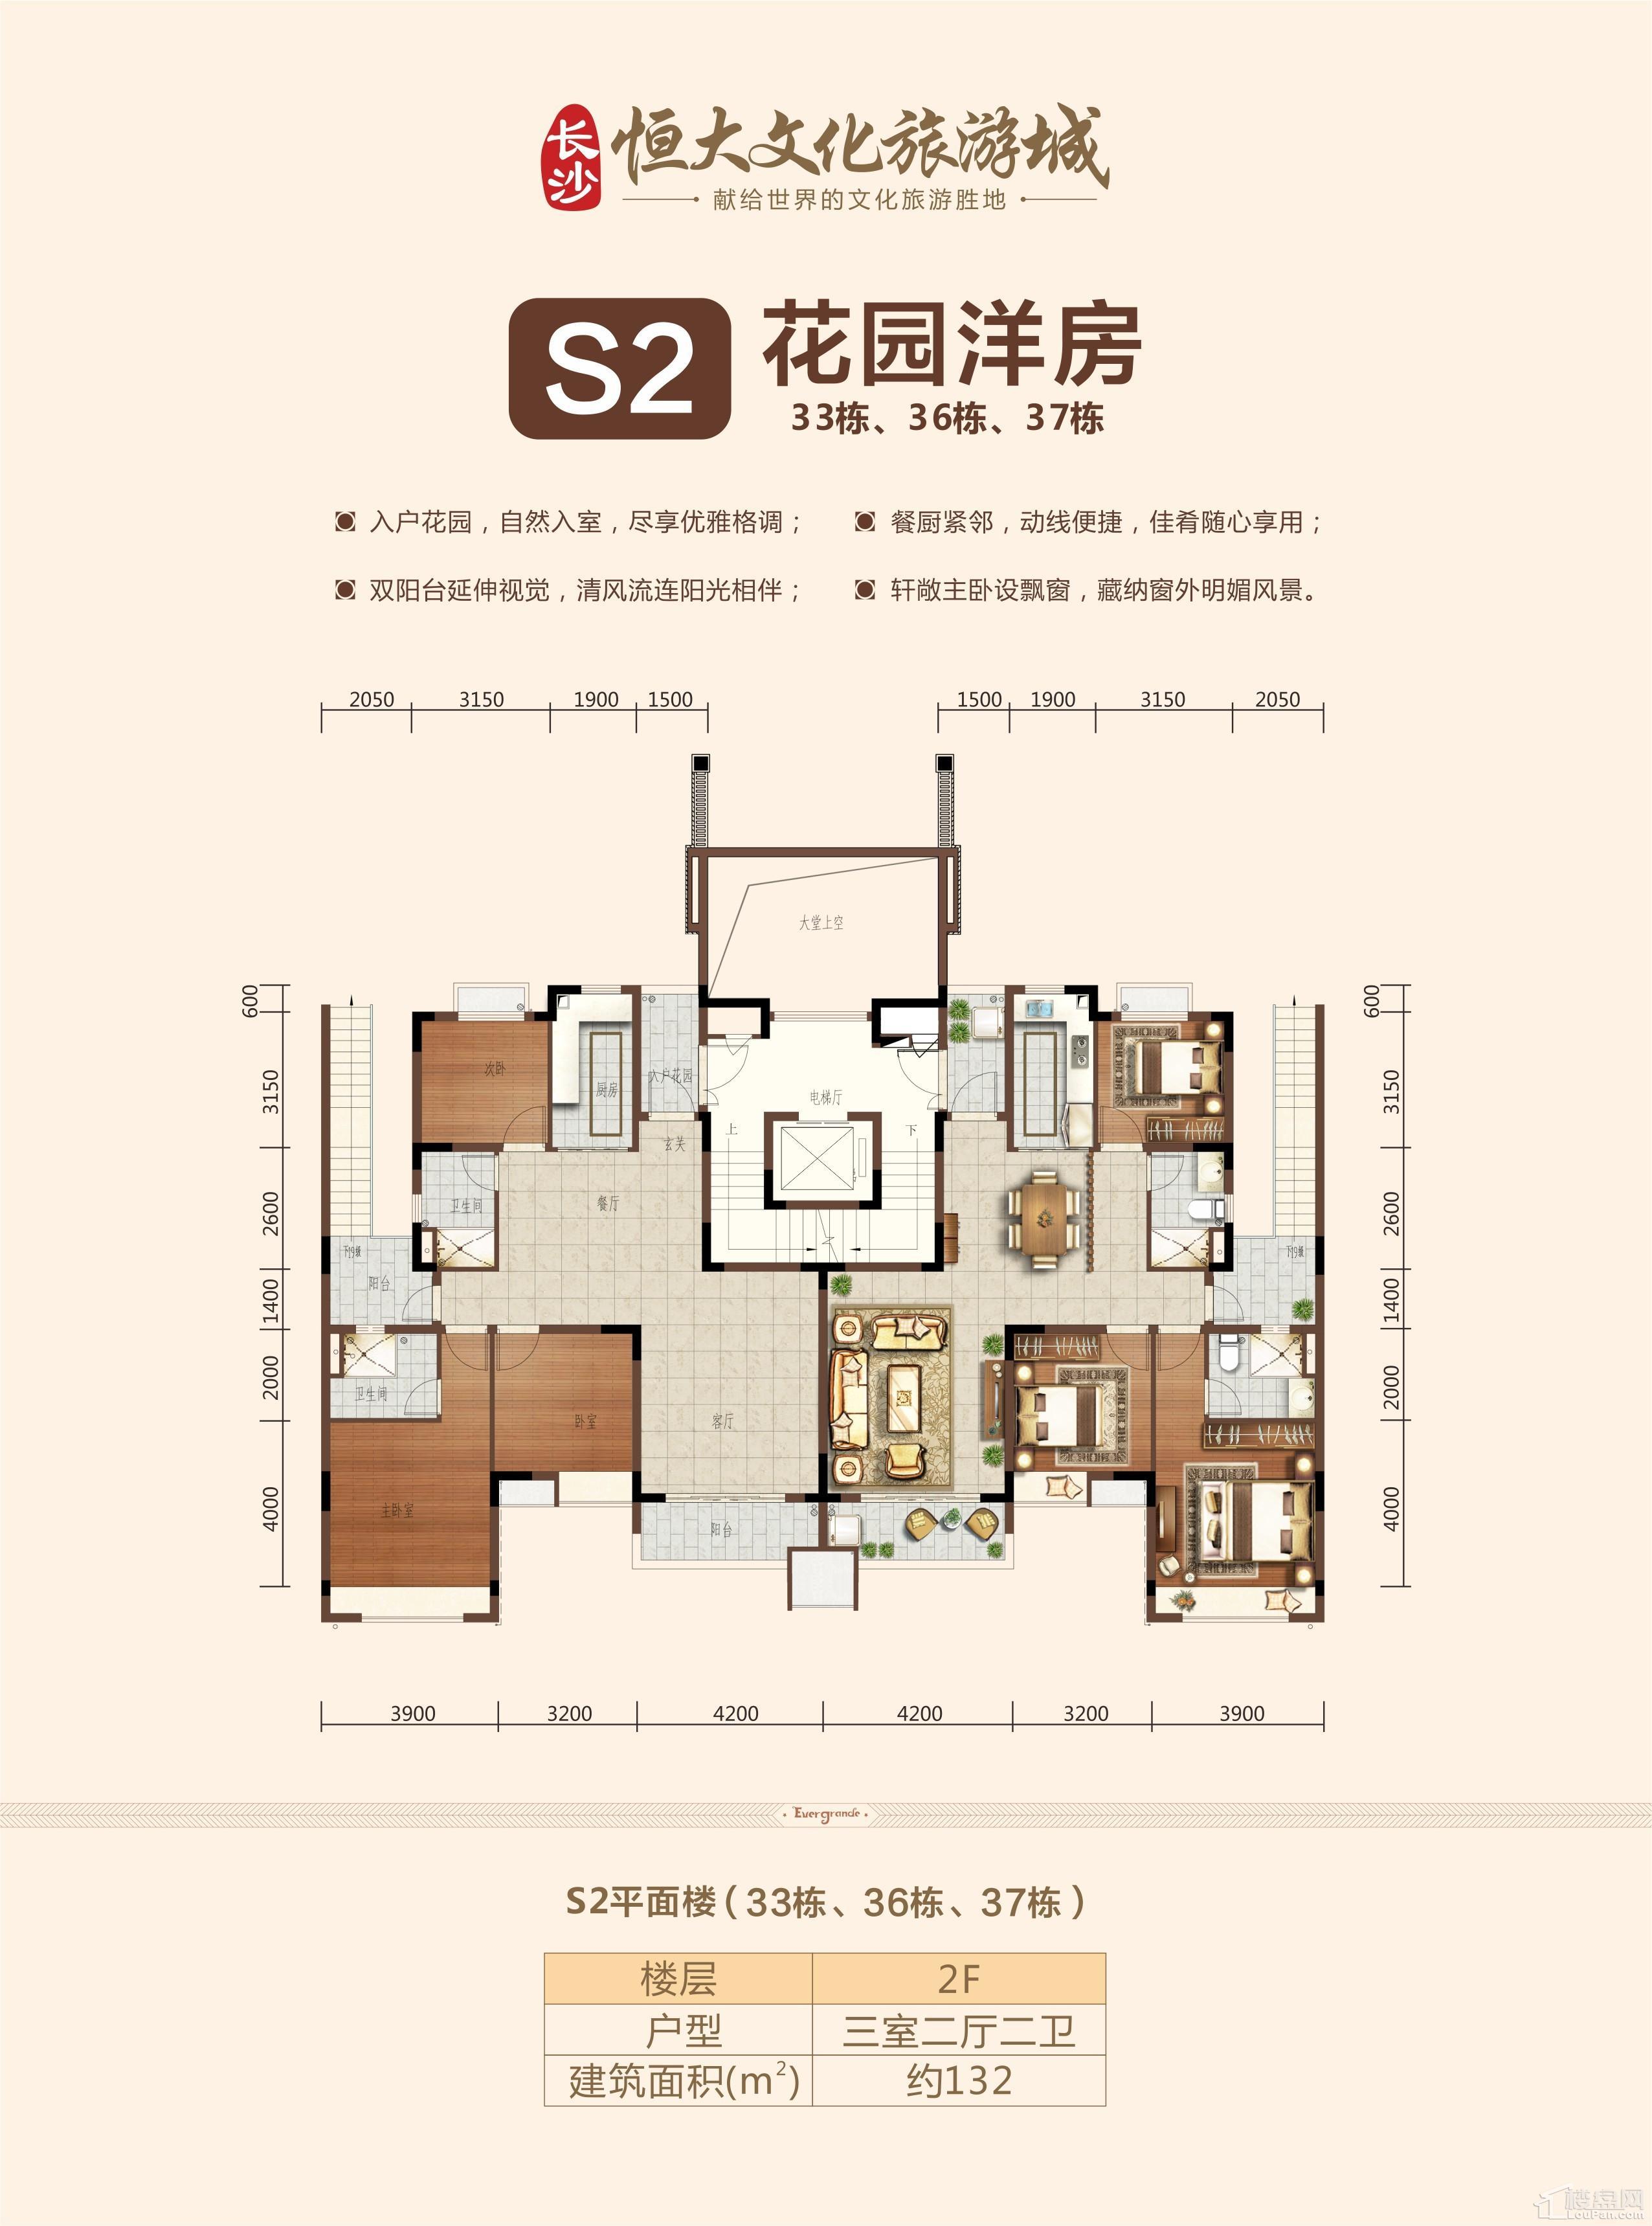 S2花园洋房二层